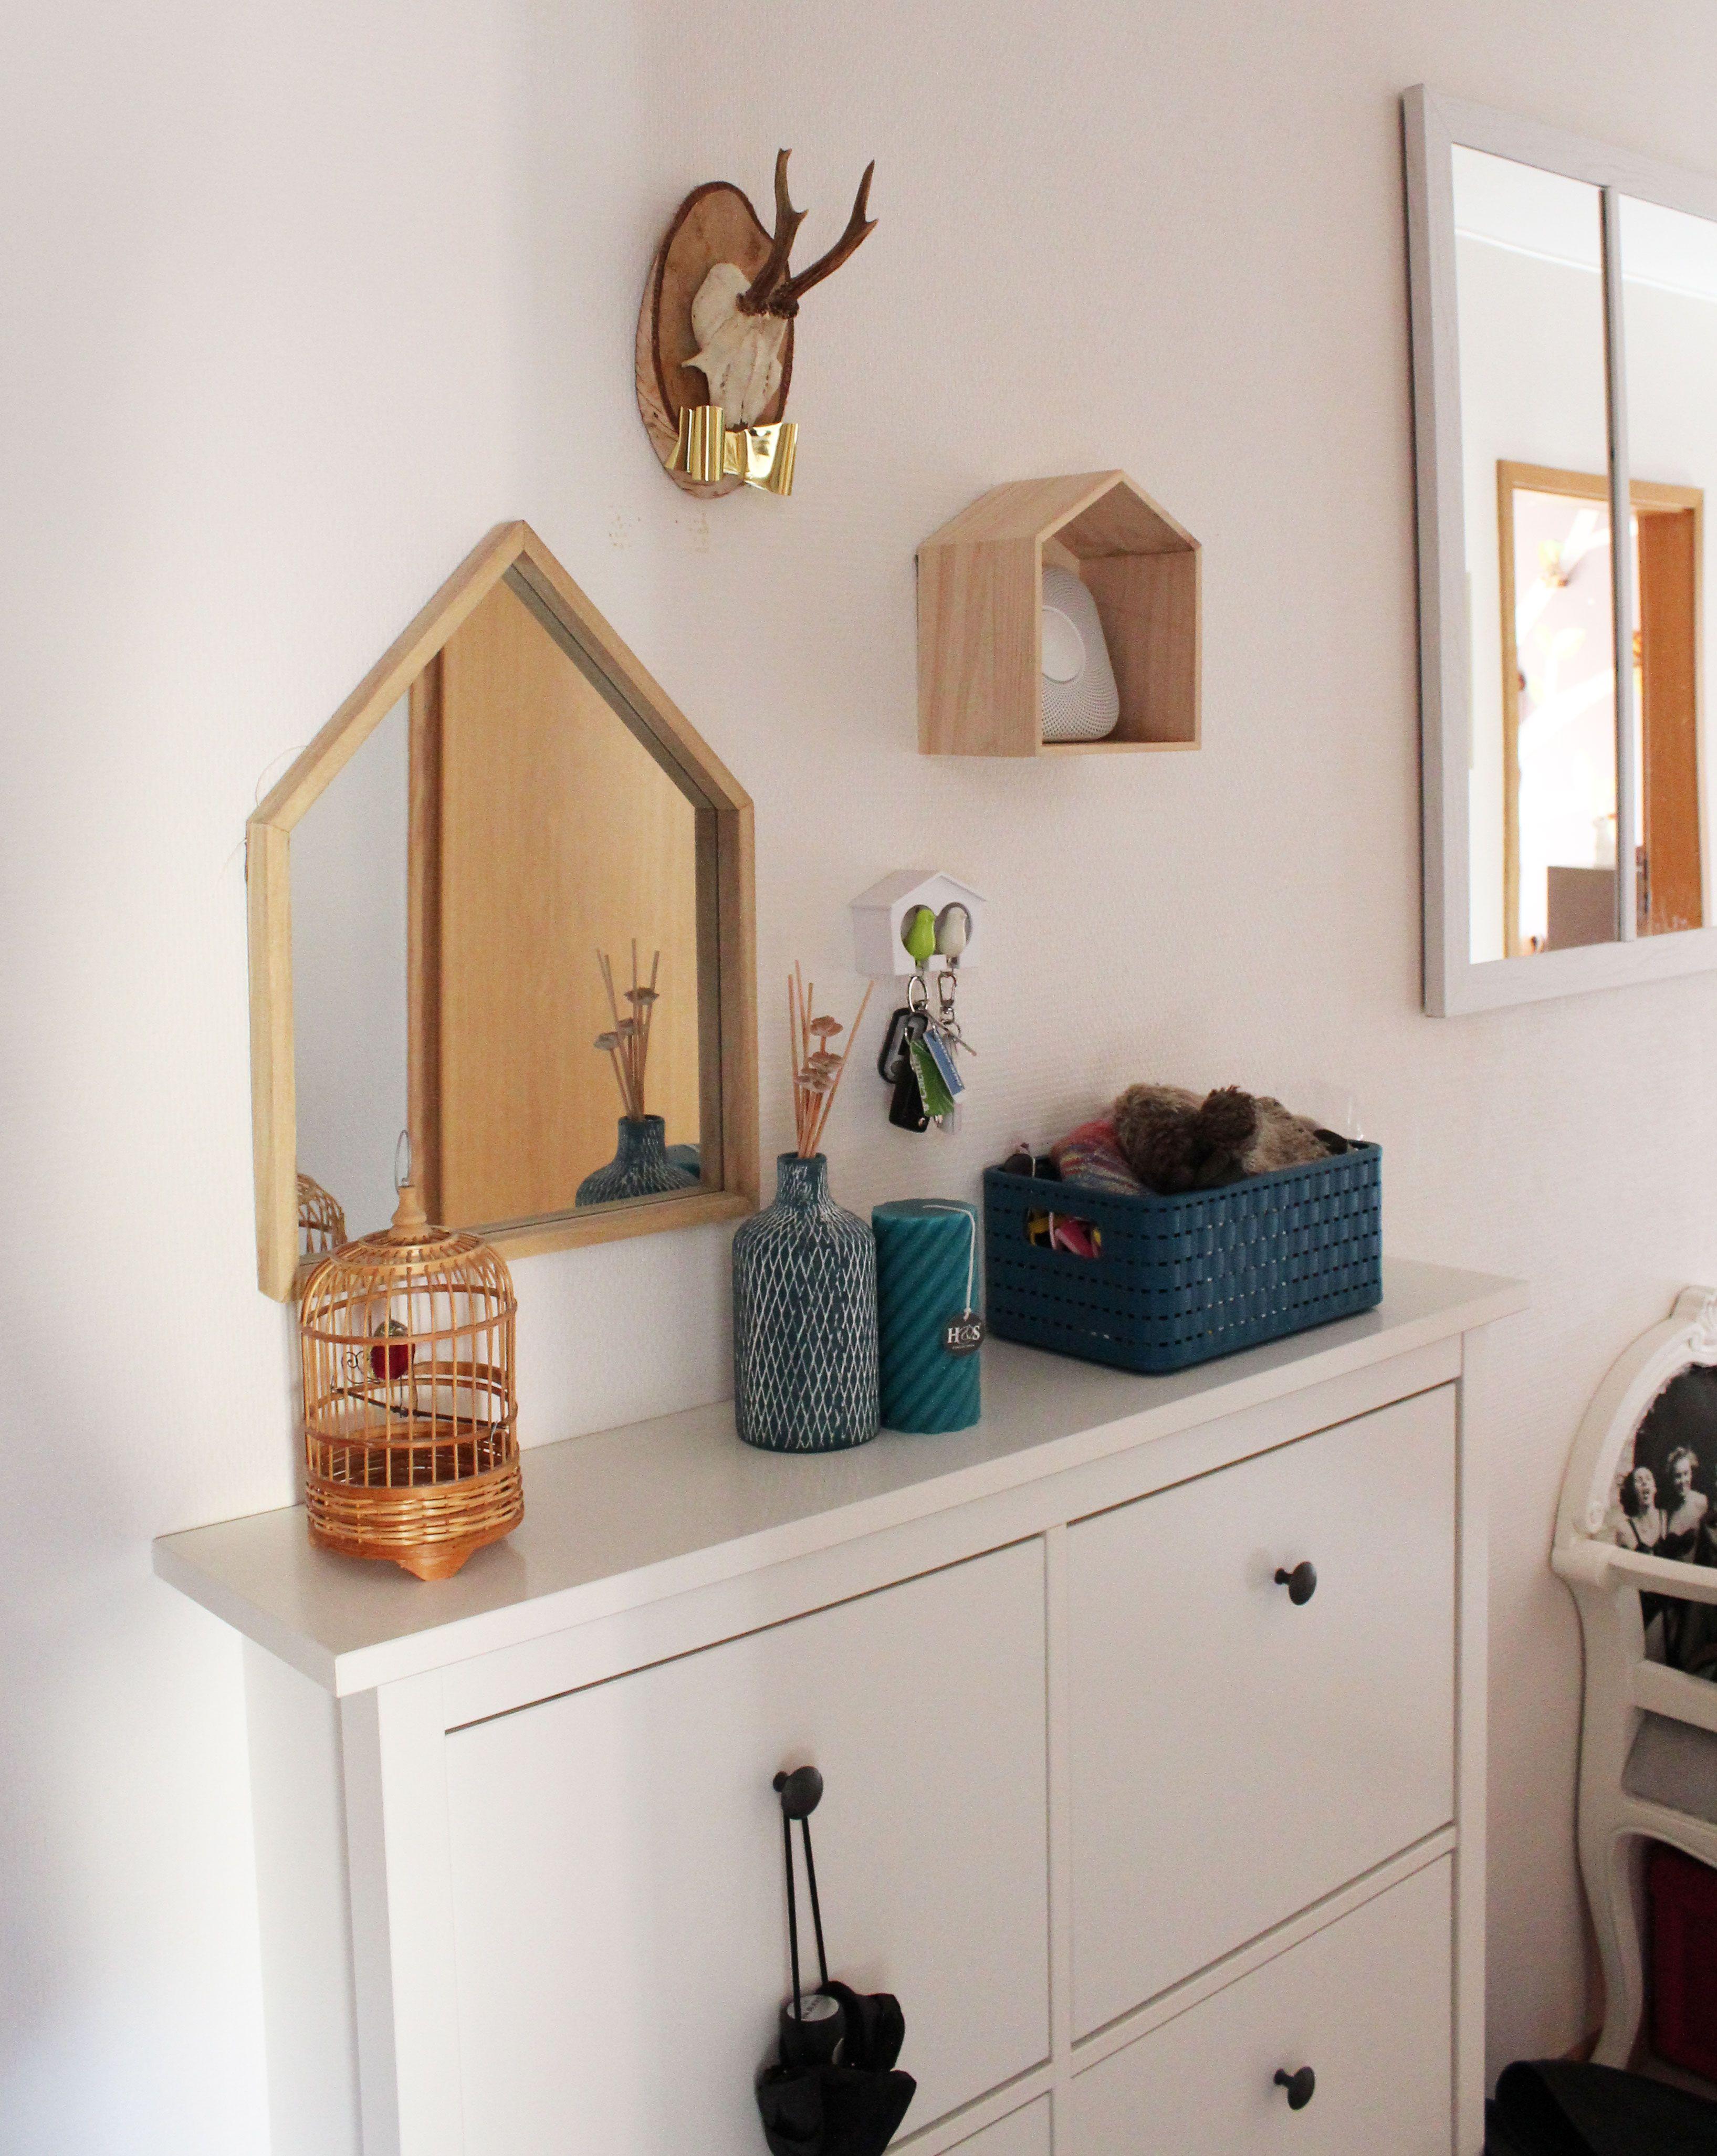 d coration relooking couloir entr e bleu p trole troph e miroir verri re iddiy interior. Black Bedroom Furniture Sets. Home Design Ideas